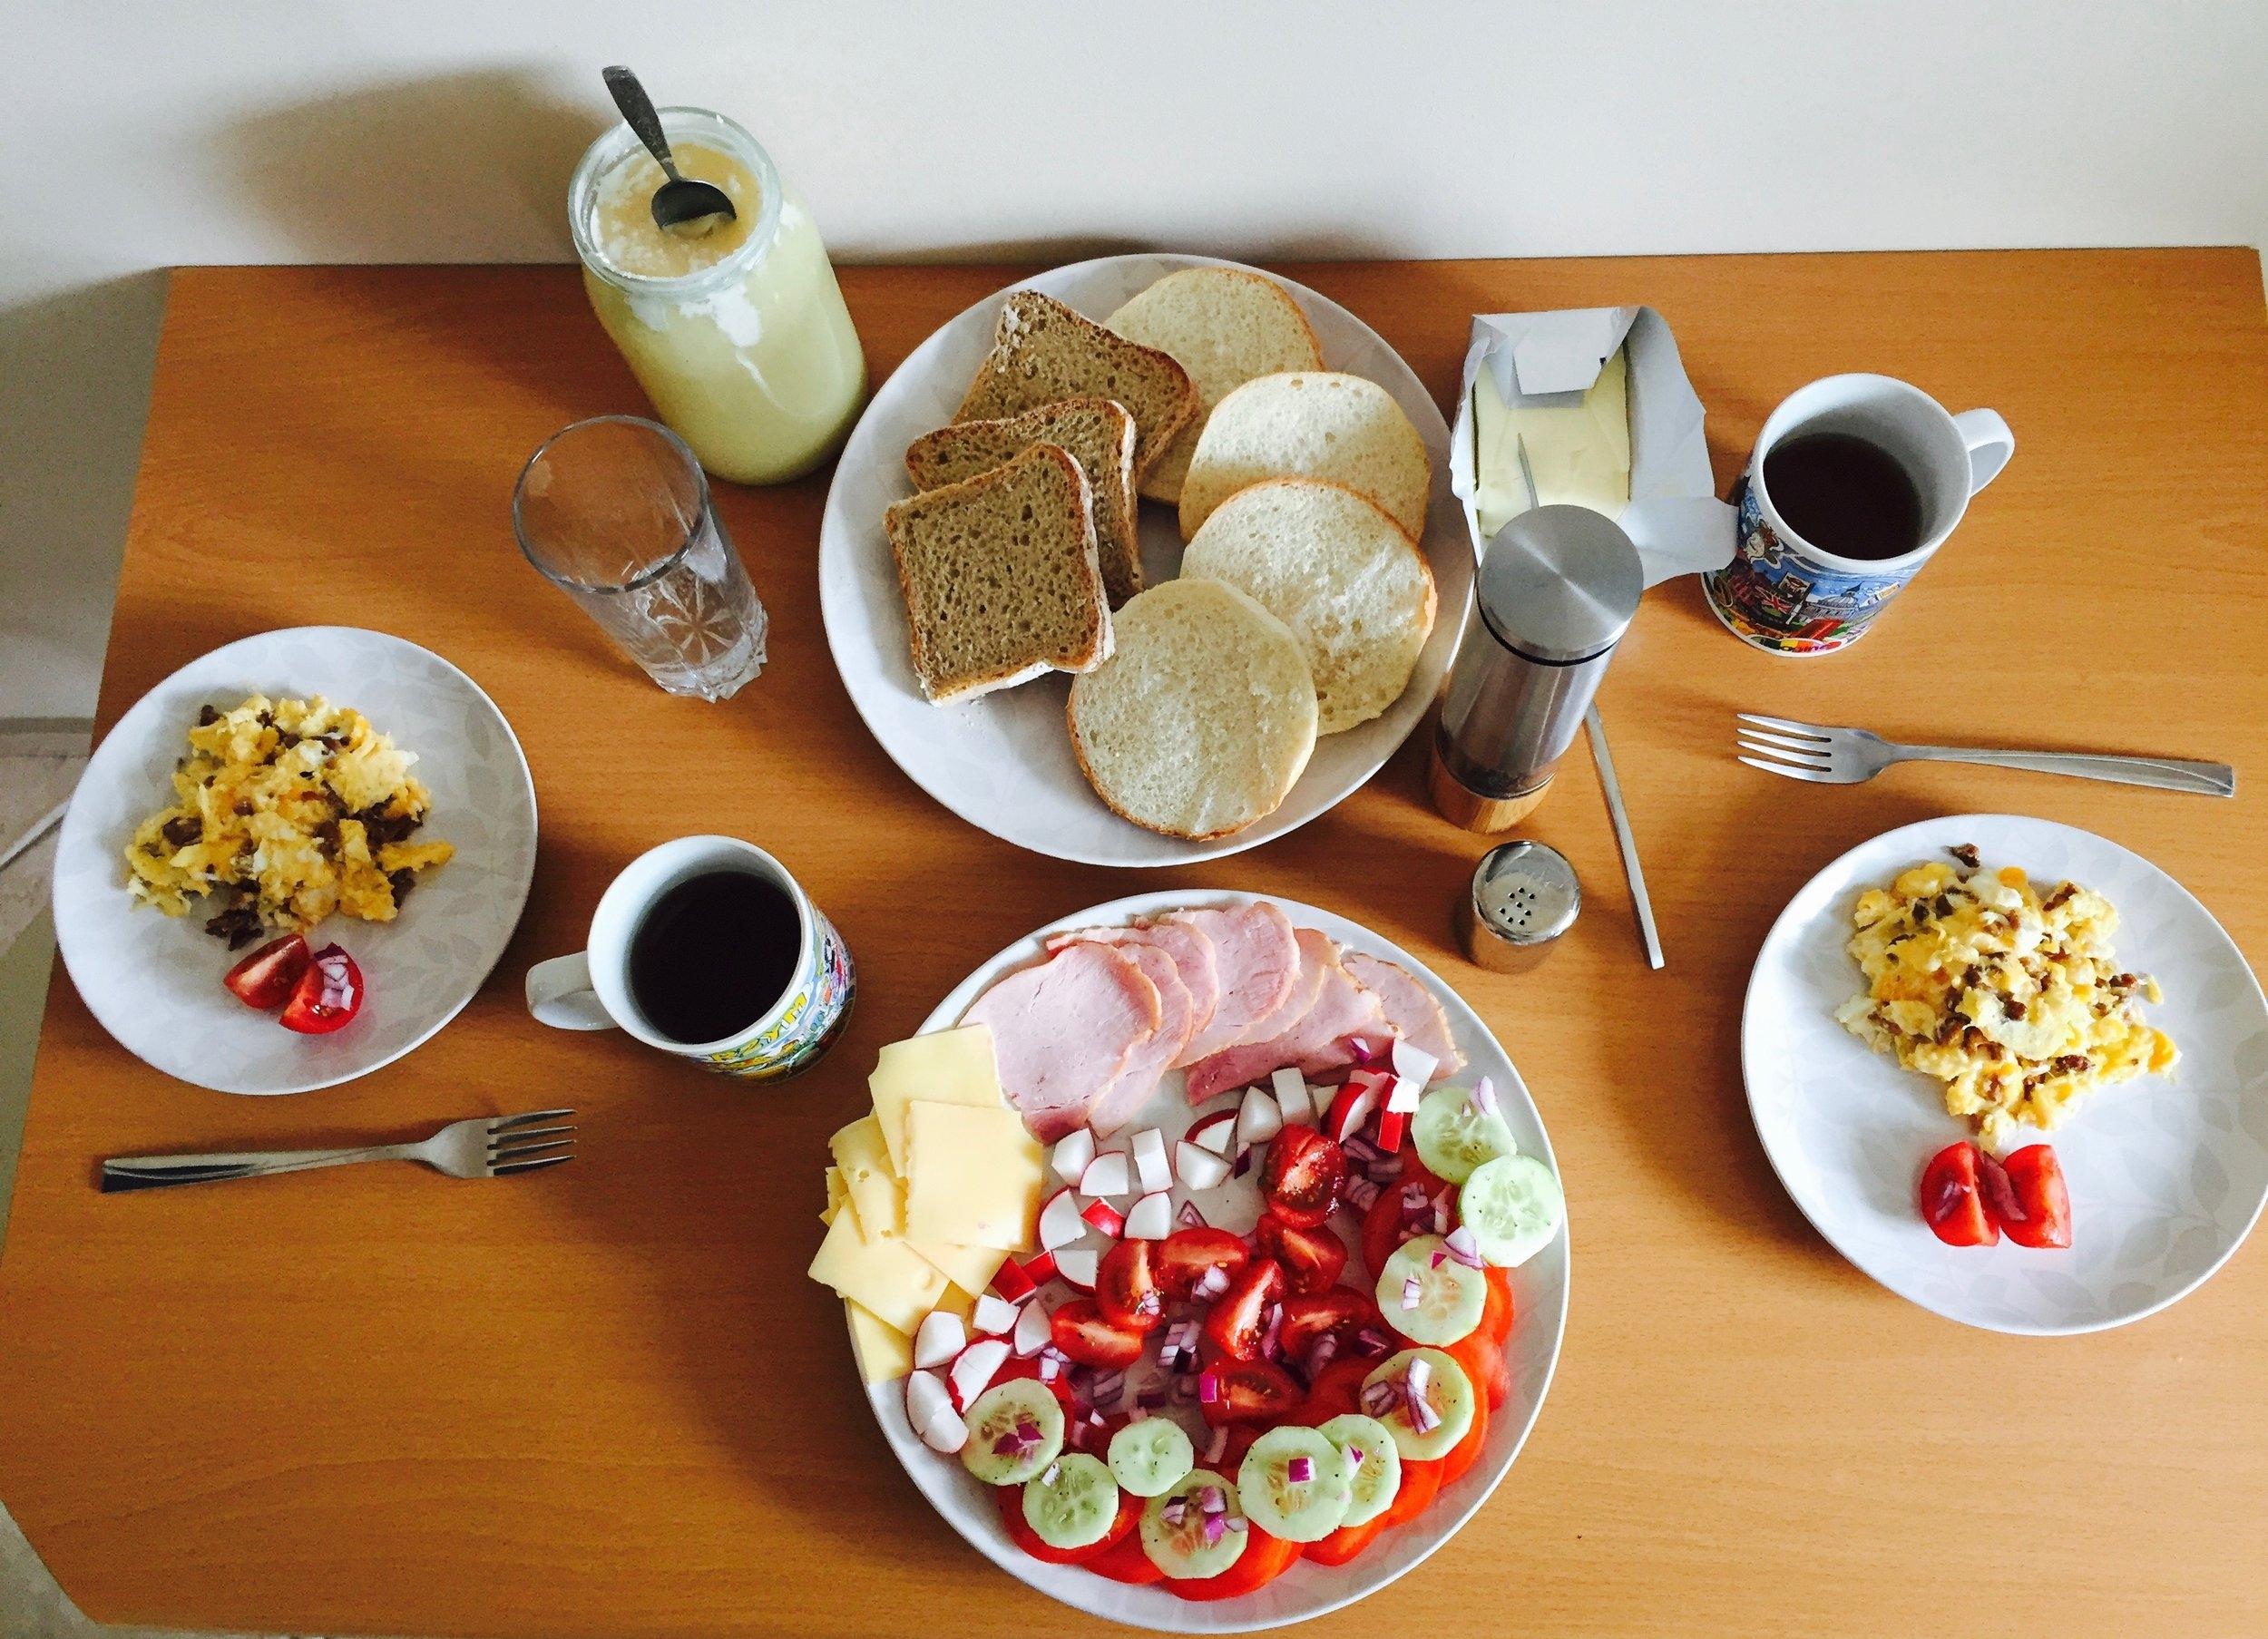 Yummy Polish Breakfast made by Chef Jacek!